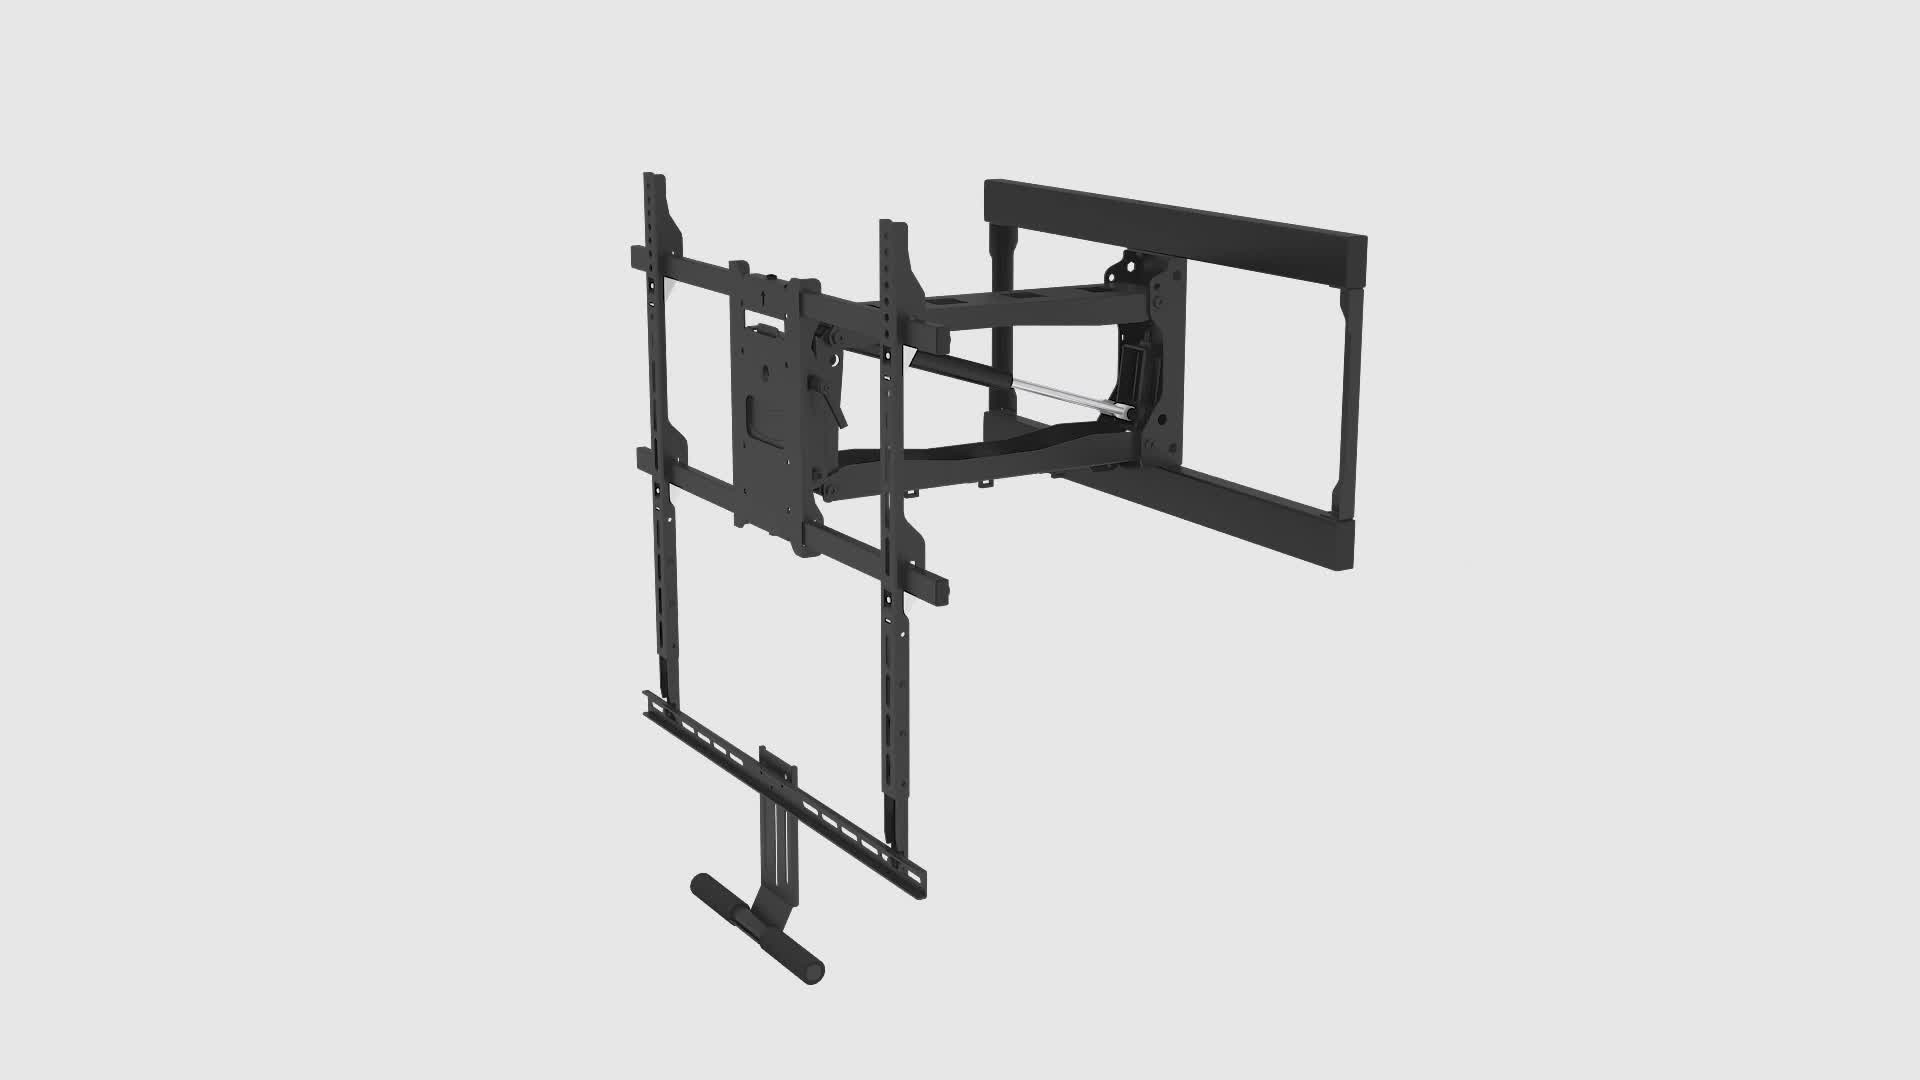 Proveedor Chino de chimenea baja de movimiento completo LCD LED TV de Pared Soporte de montaje con resorte de Gas